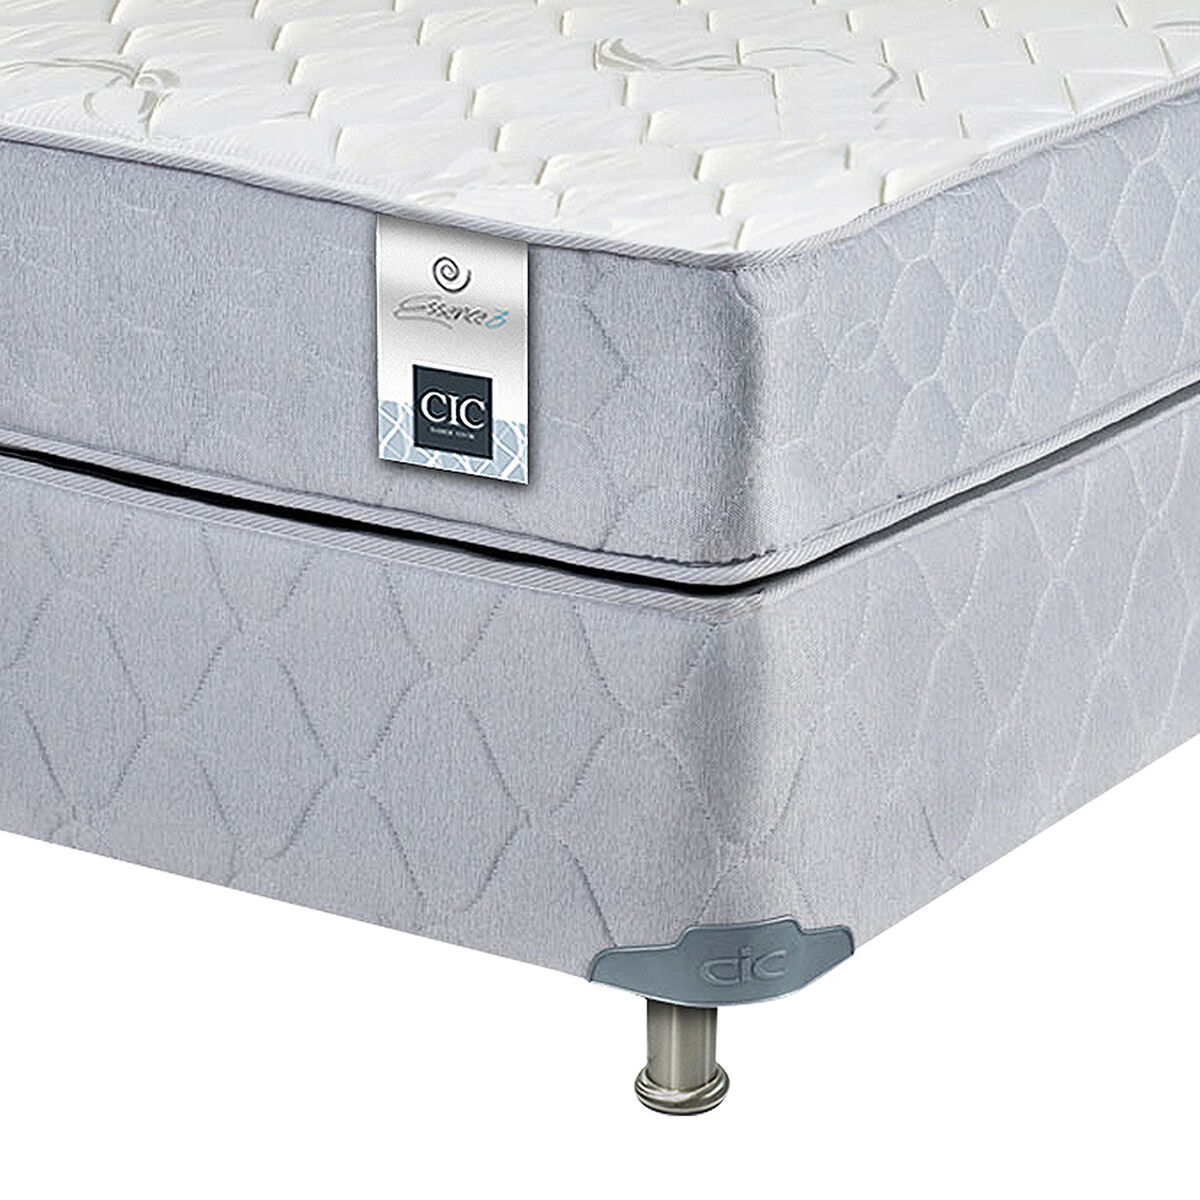 Box Americano CIC 1 Plaza+Set Munich+Textil+Almohada